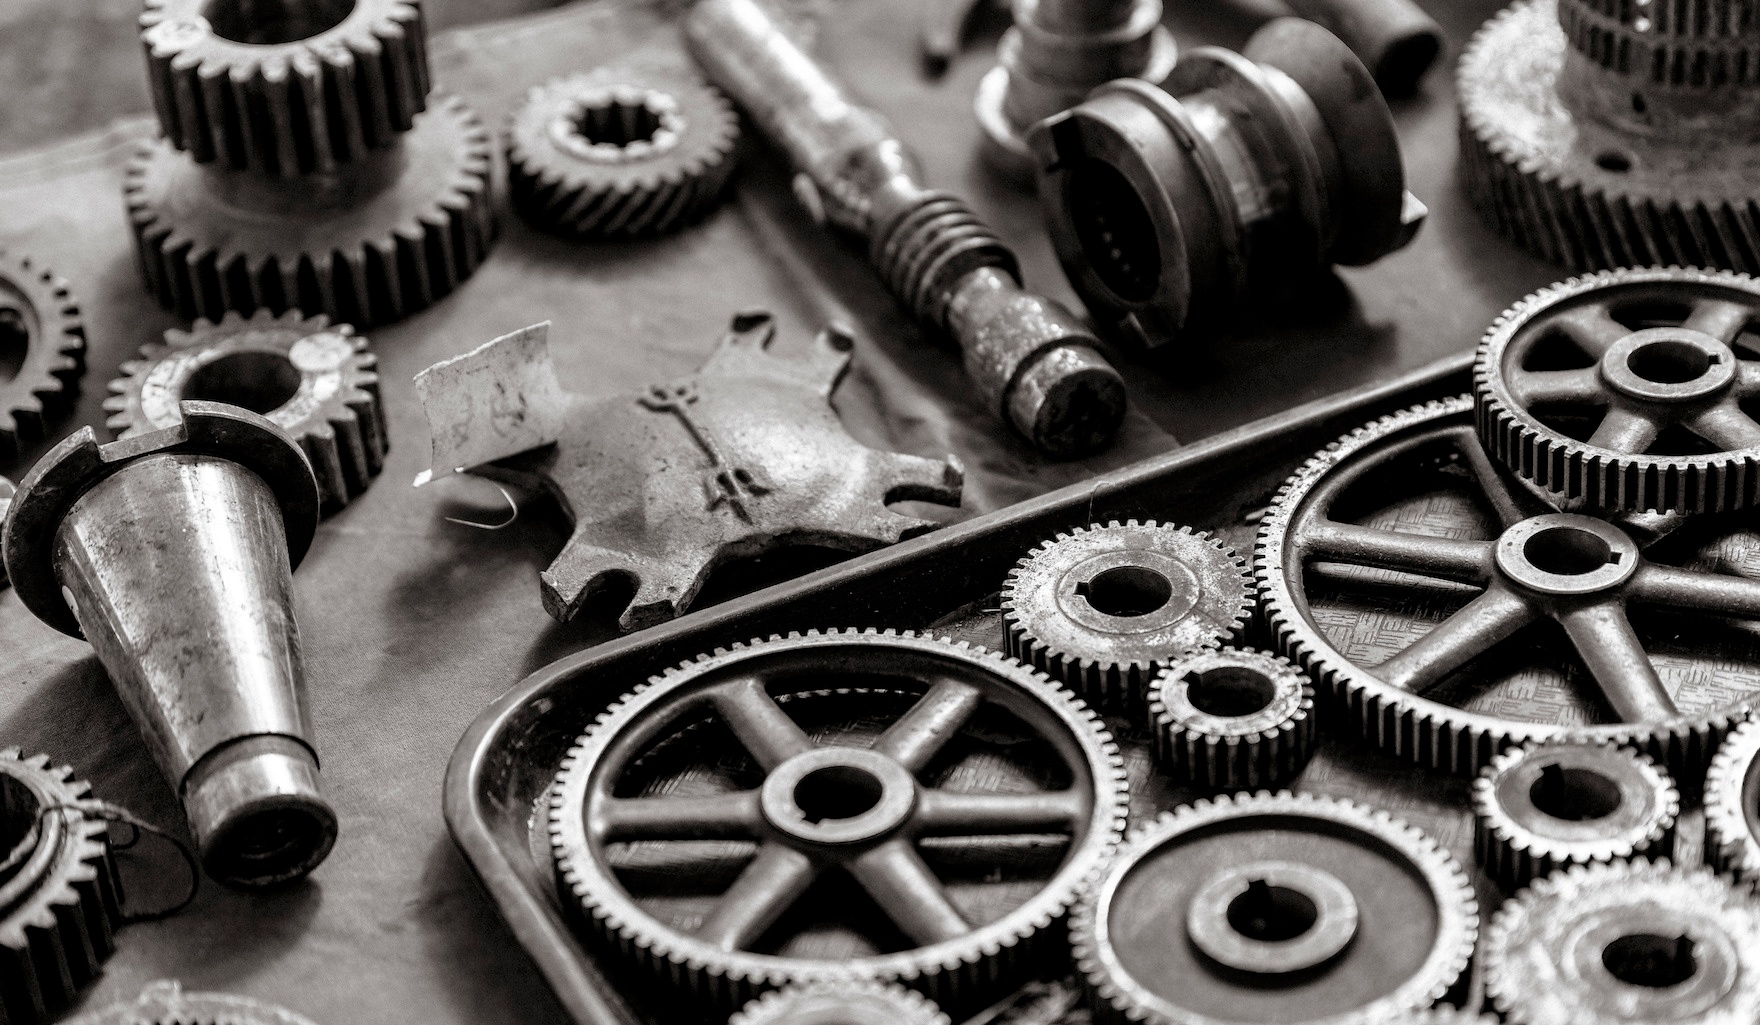 How to buy landscape business management software, part 5: Product Development